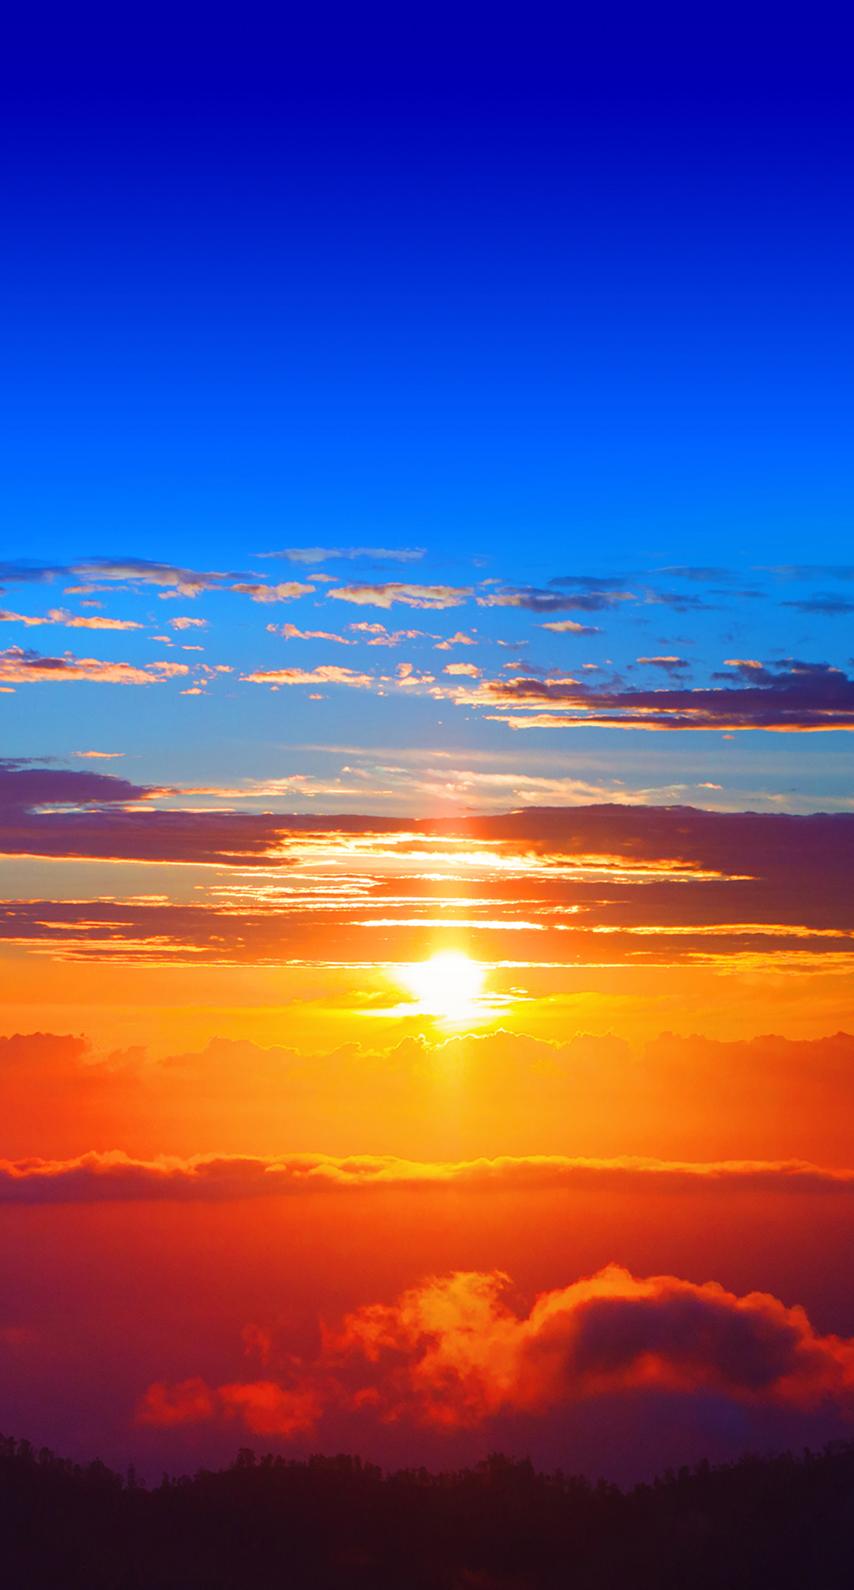 sunset, light